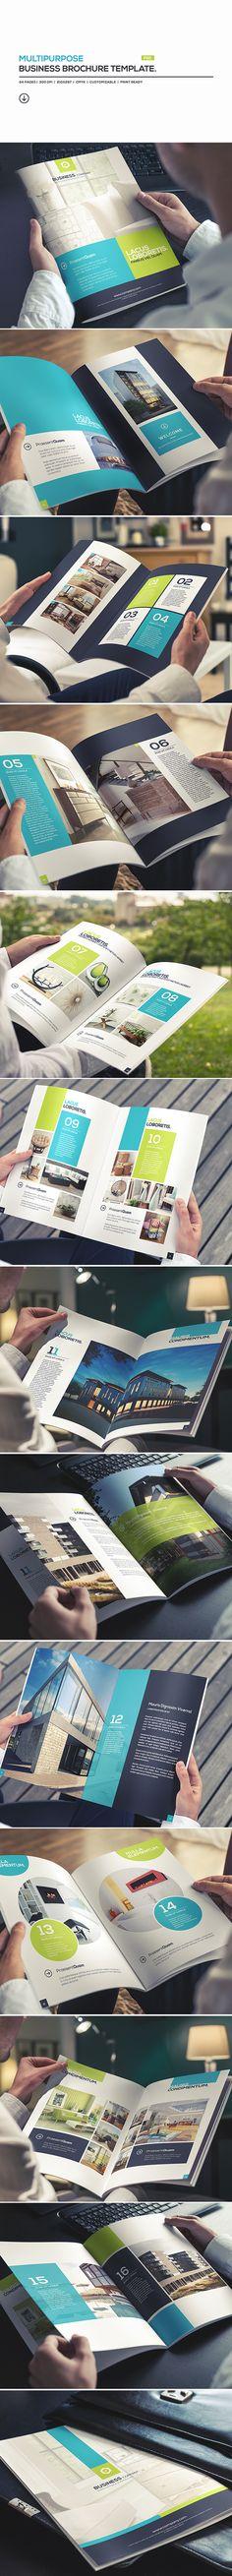 Multipurpose Business Brochure Template on Behance